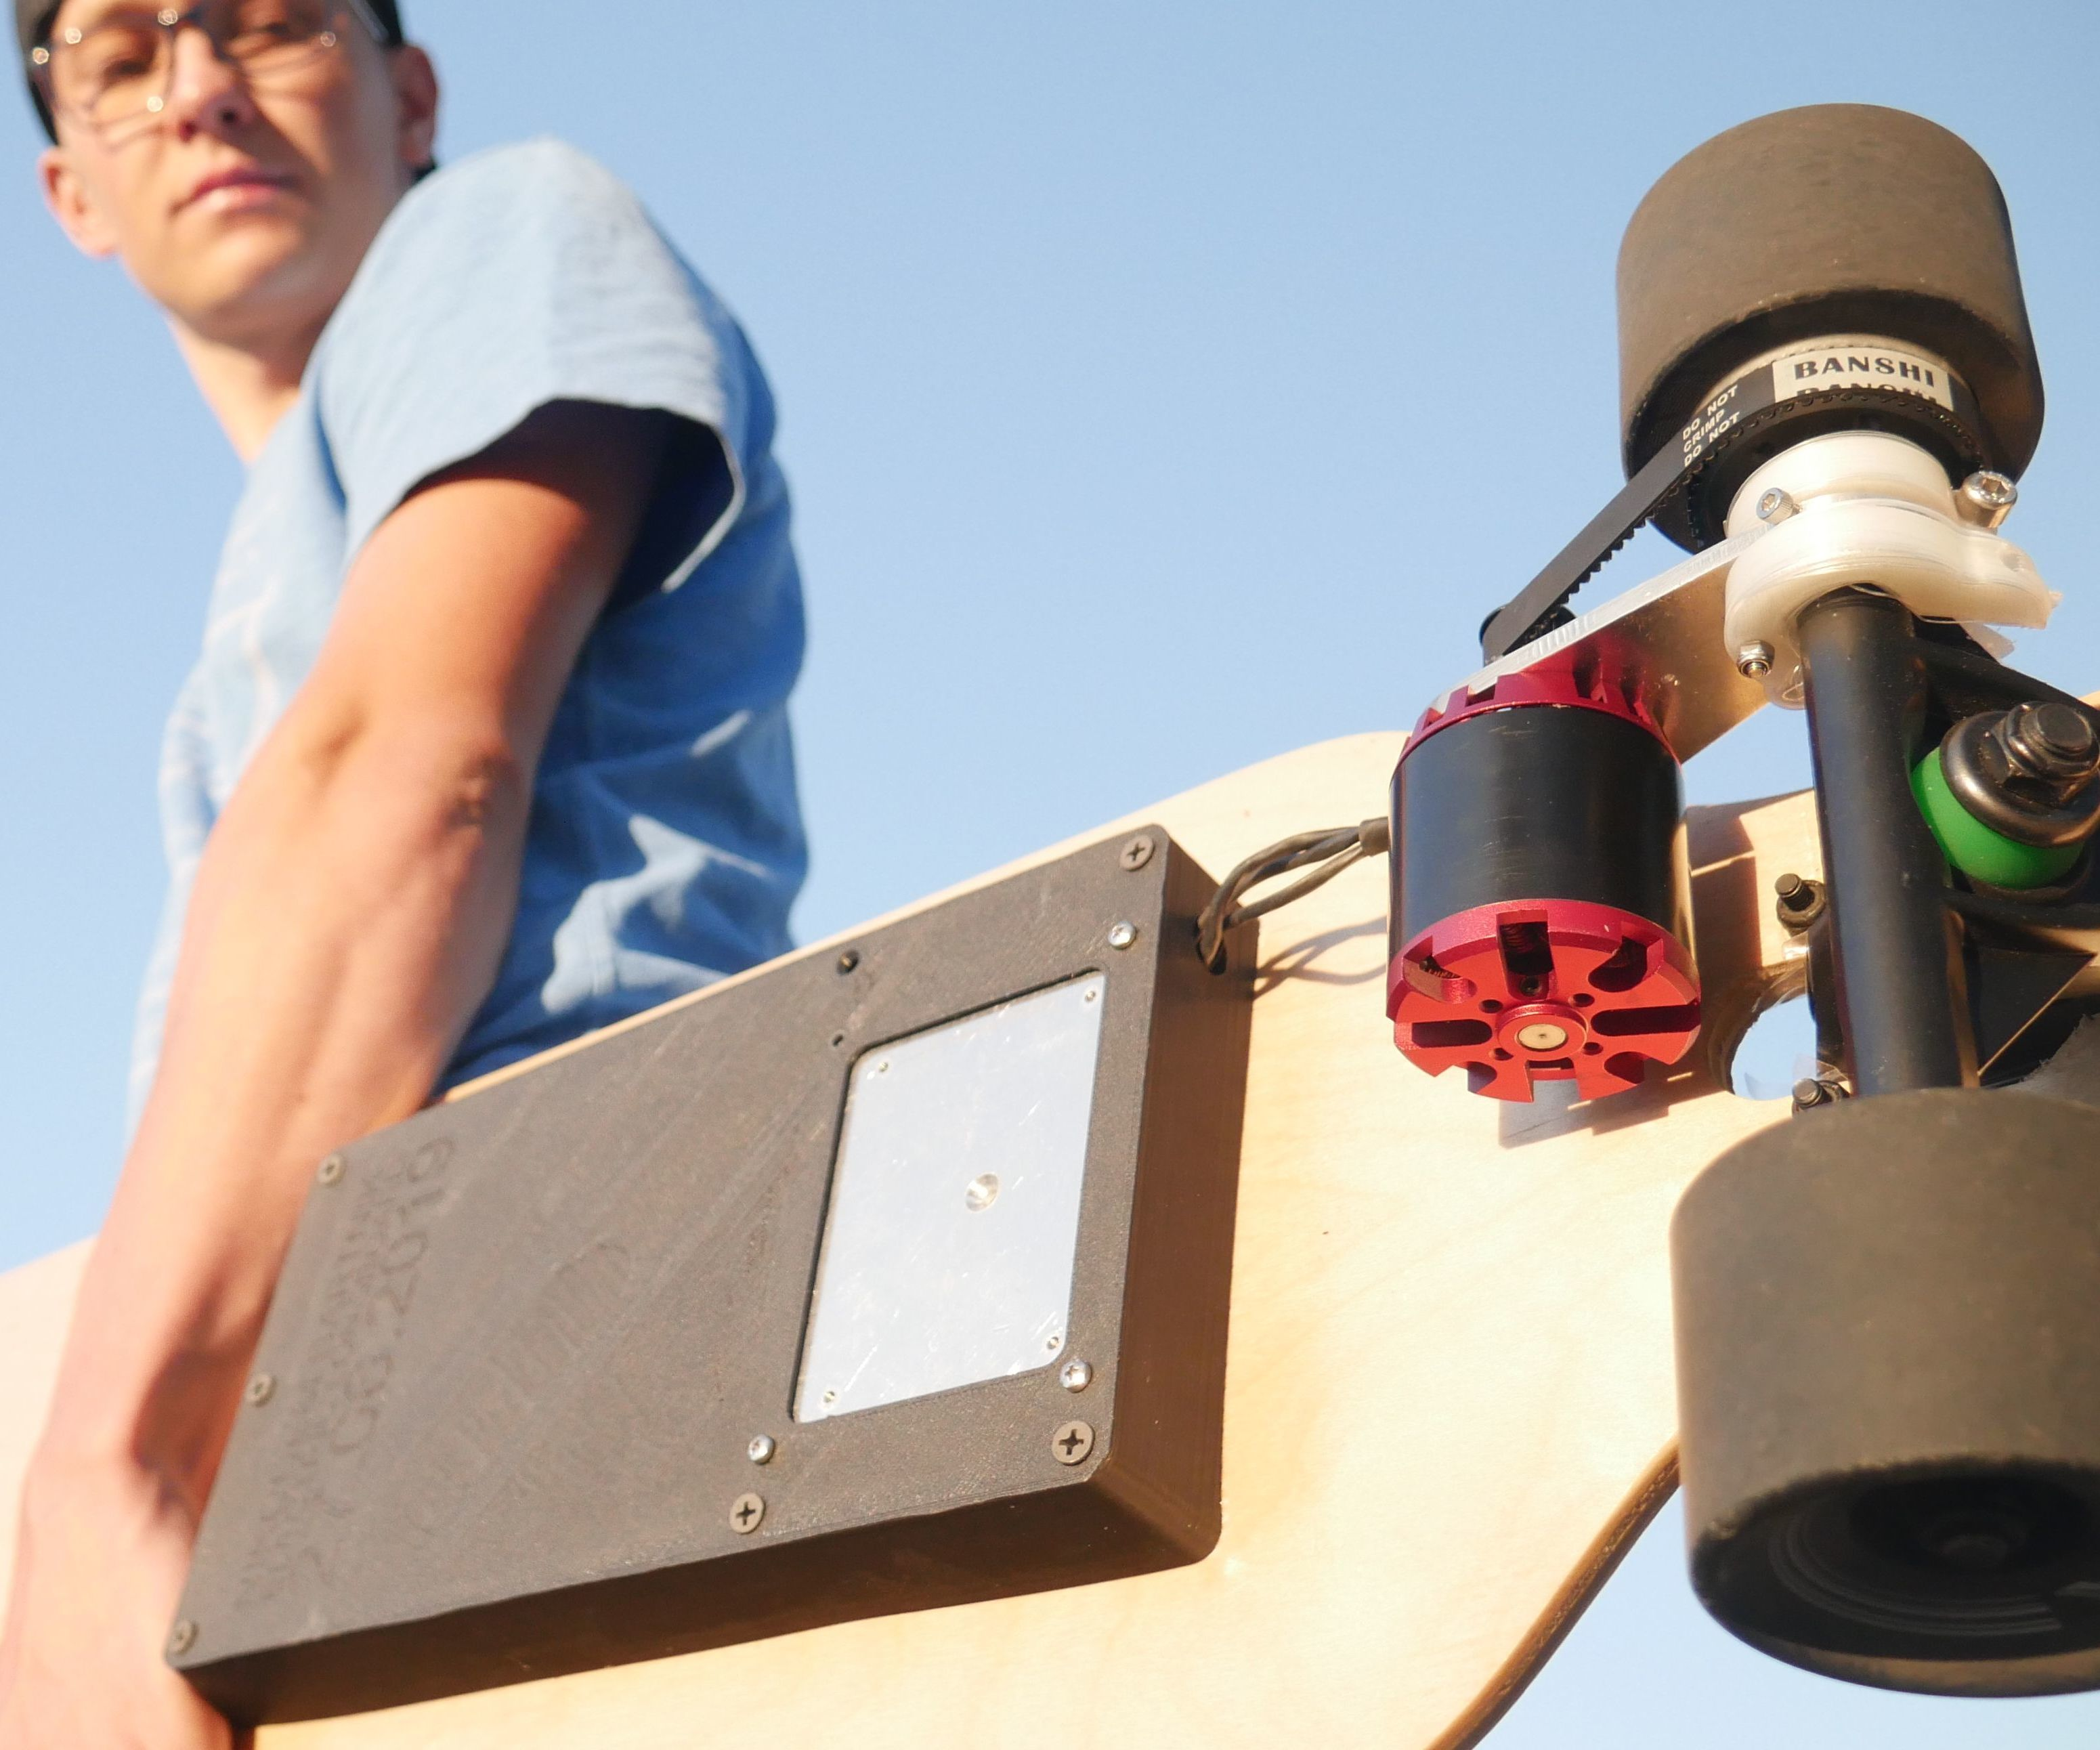 DIY $150 Electric Longboard